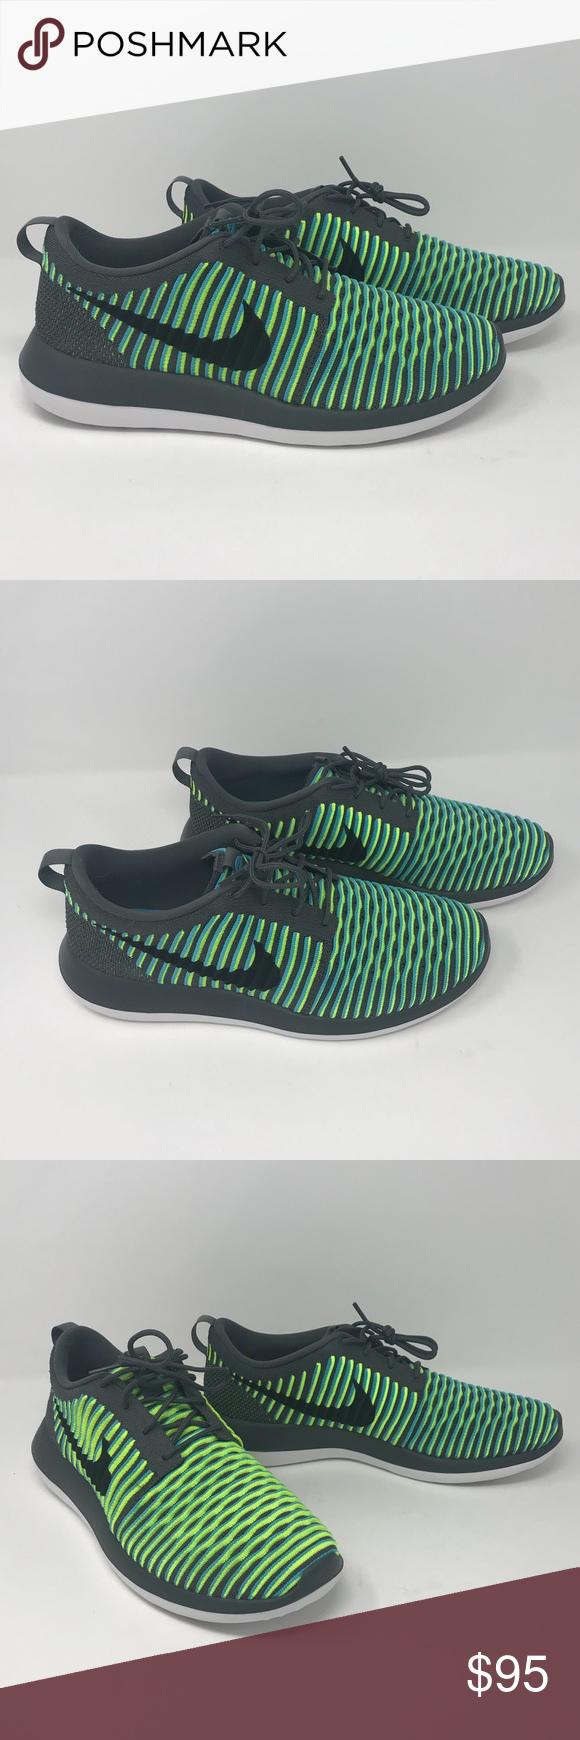 Nike Roshe Two Flyknit Men s Running Shoes Nike Roshe Two Flyknit Men s  Running Shoe Size  11 Color  Dark Grey   Black   Gamma Blue   Volt  Condition  New ... 40982864e